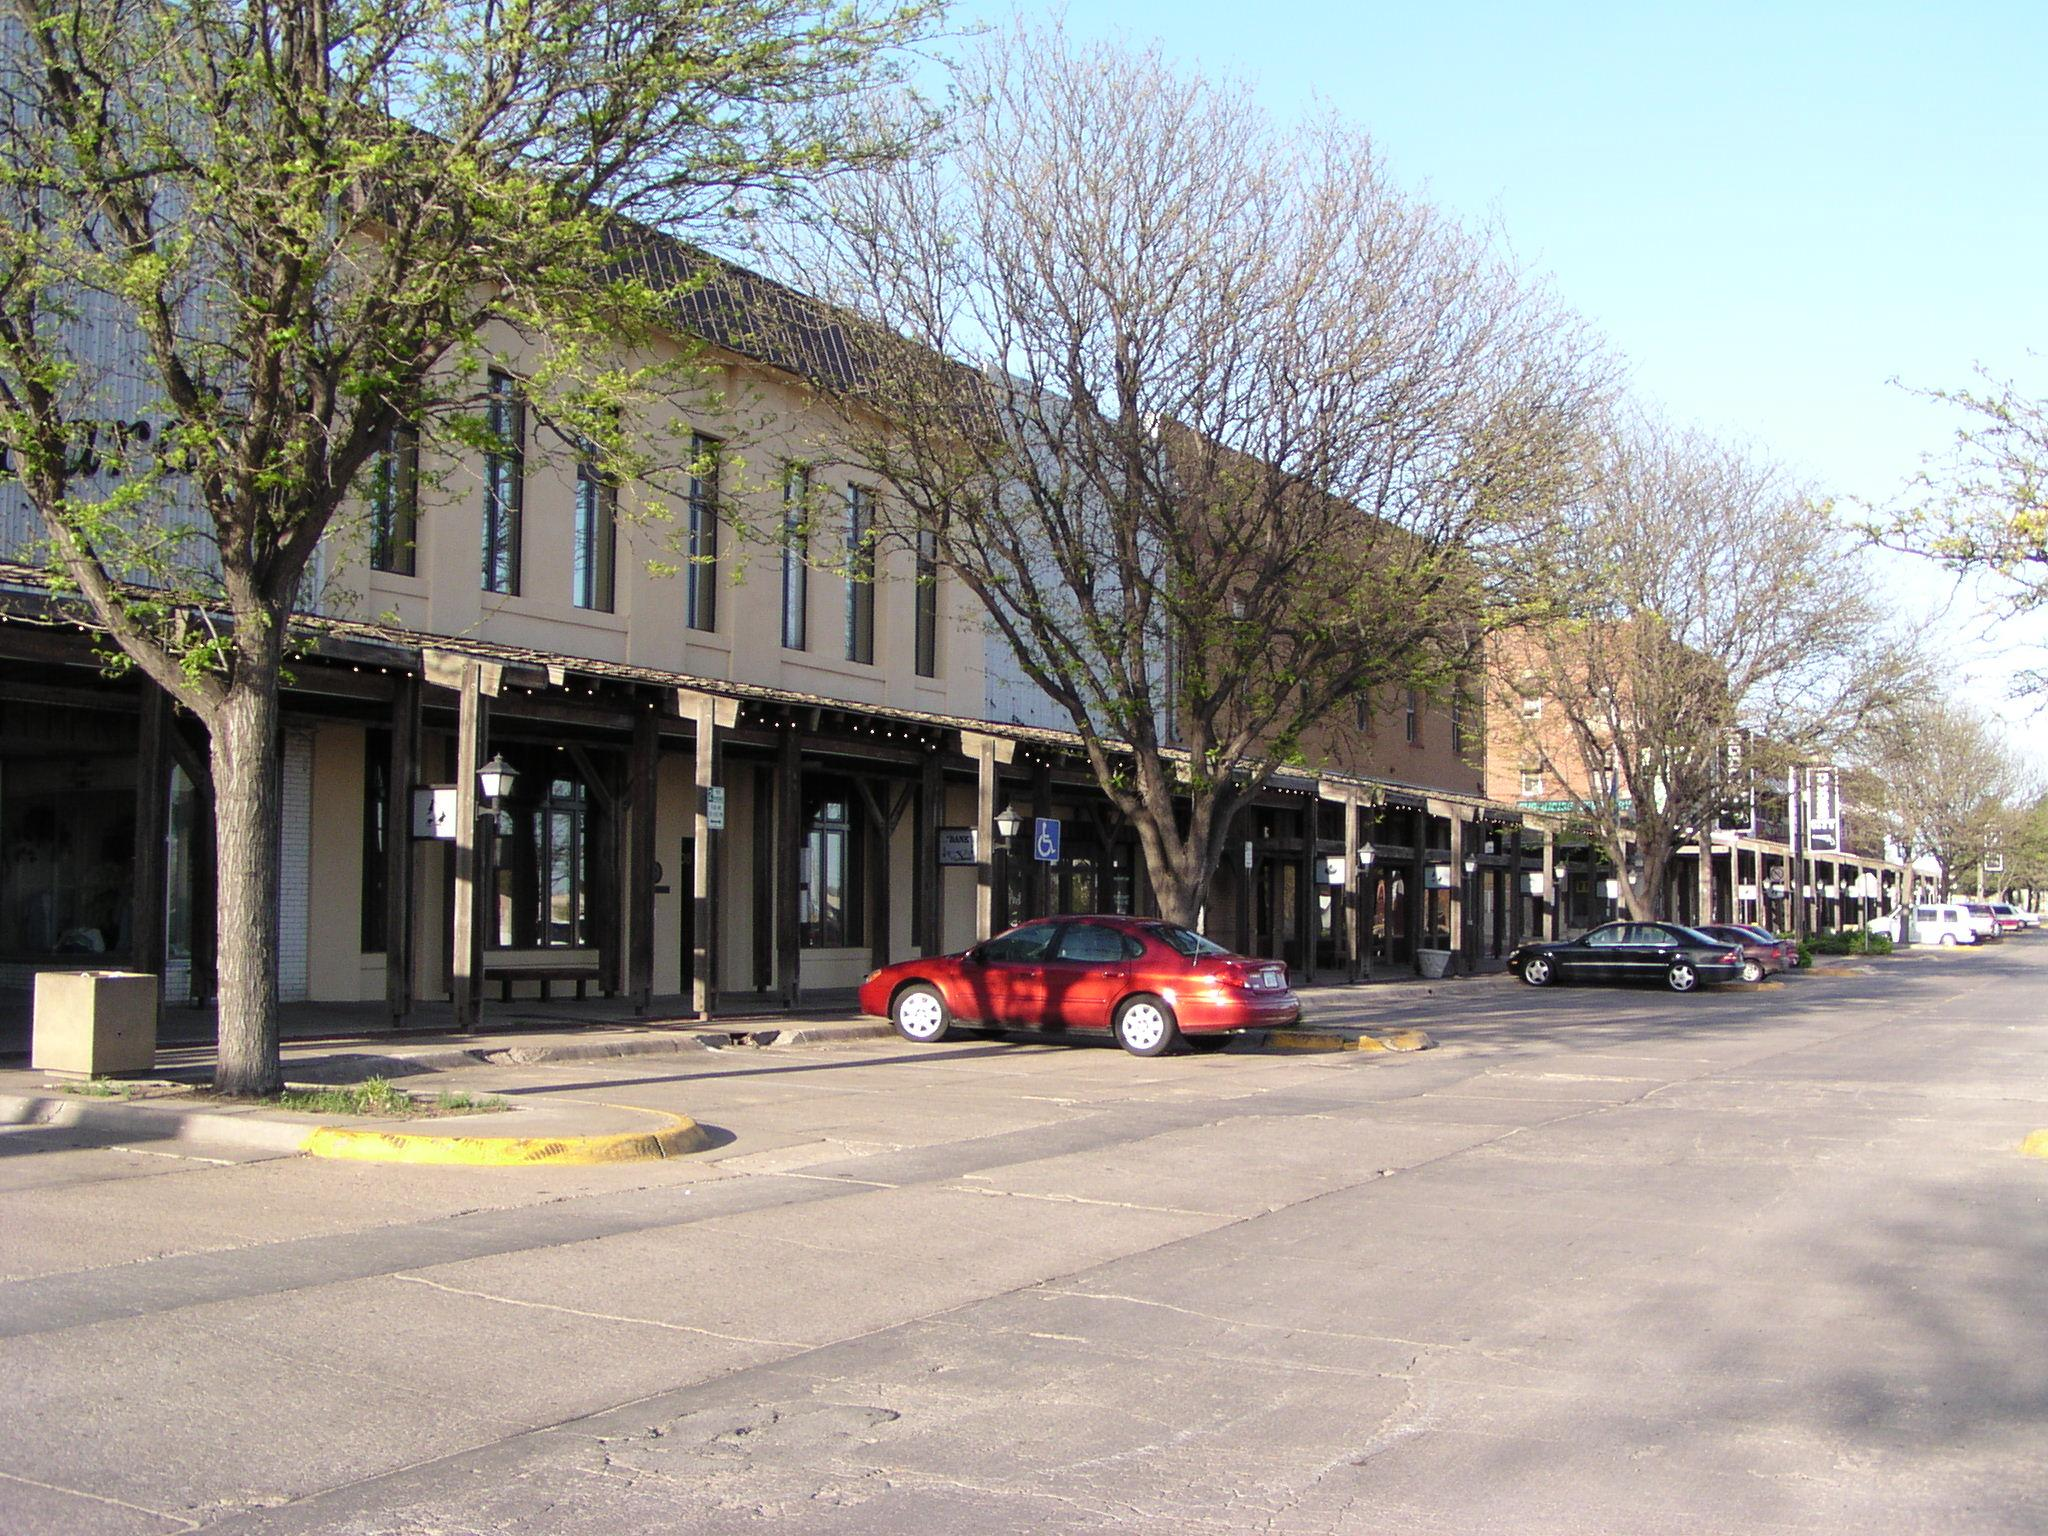 Dodge City, Kansas - April 27, 2004